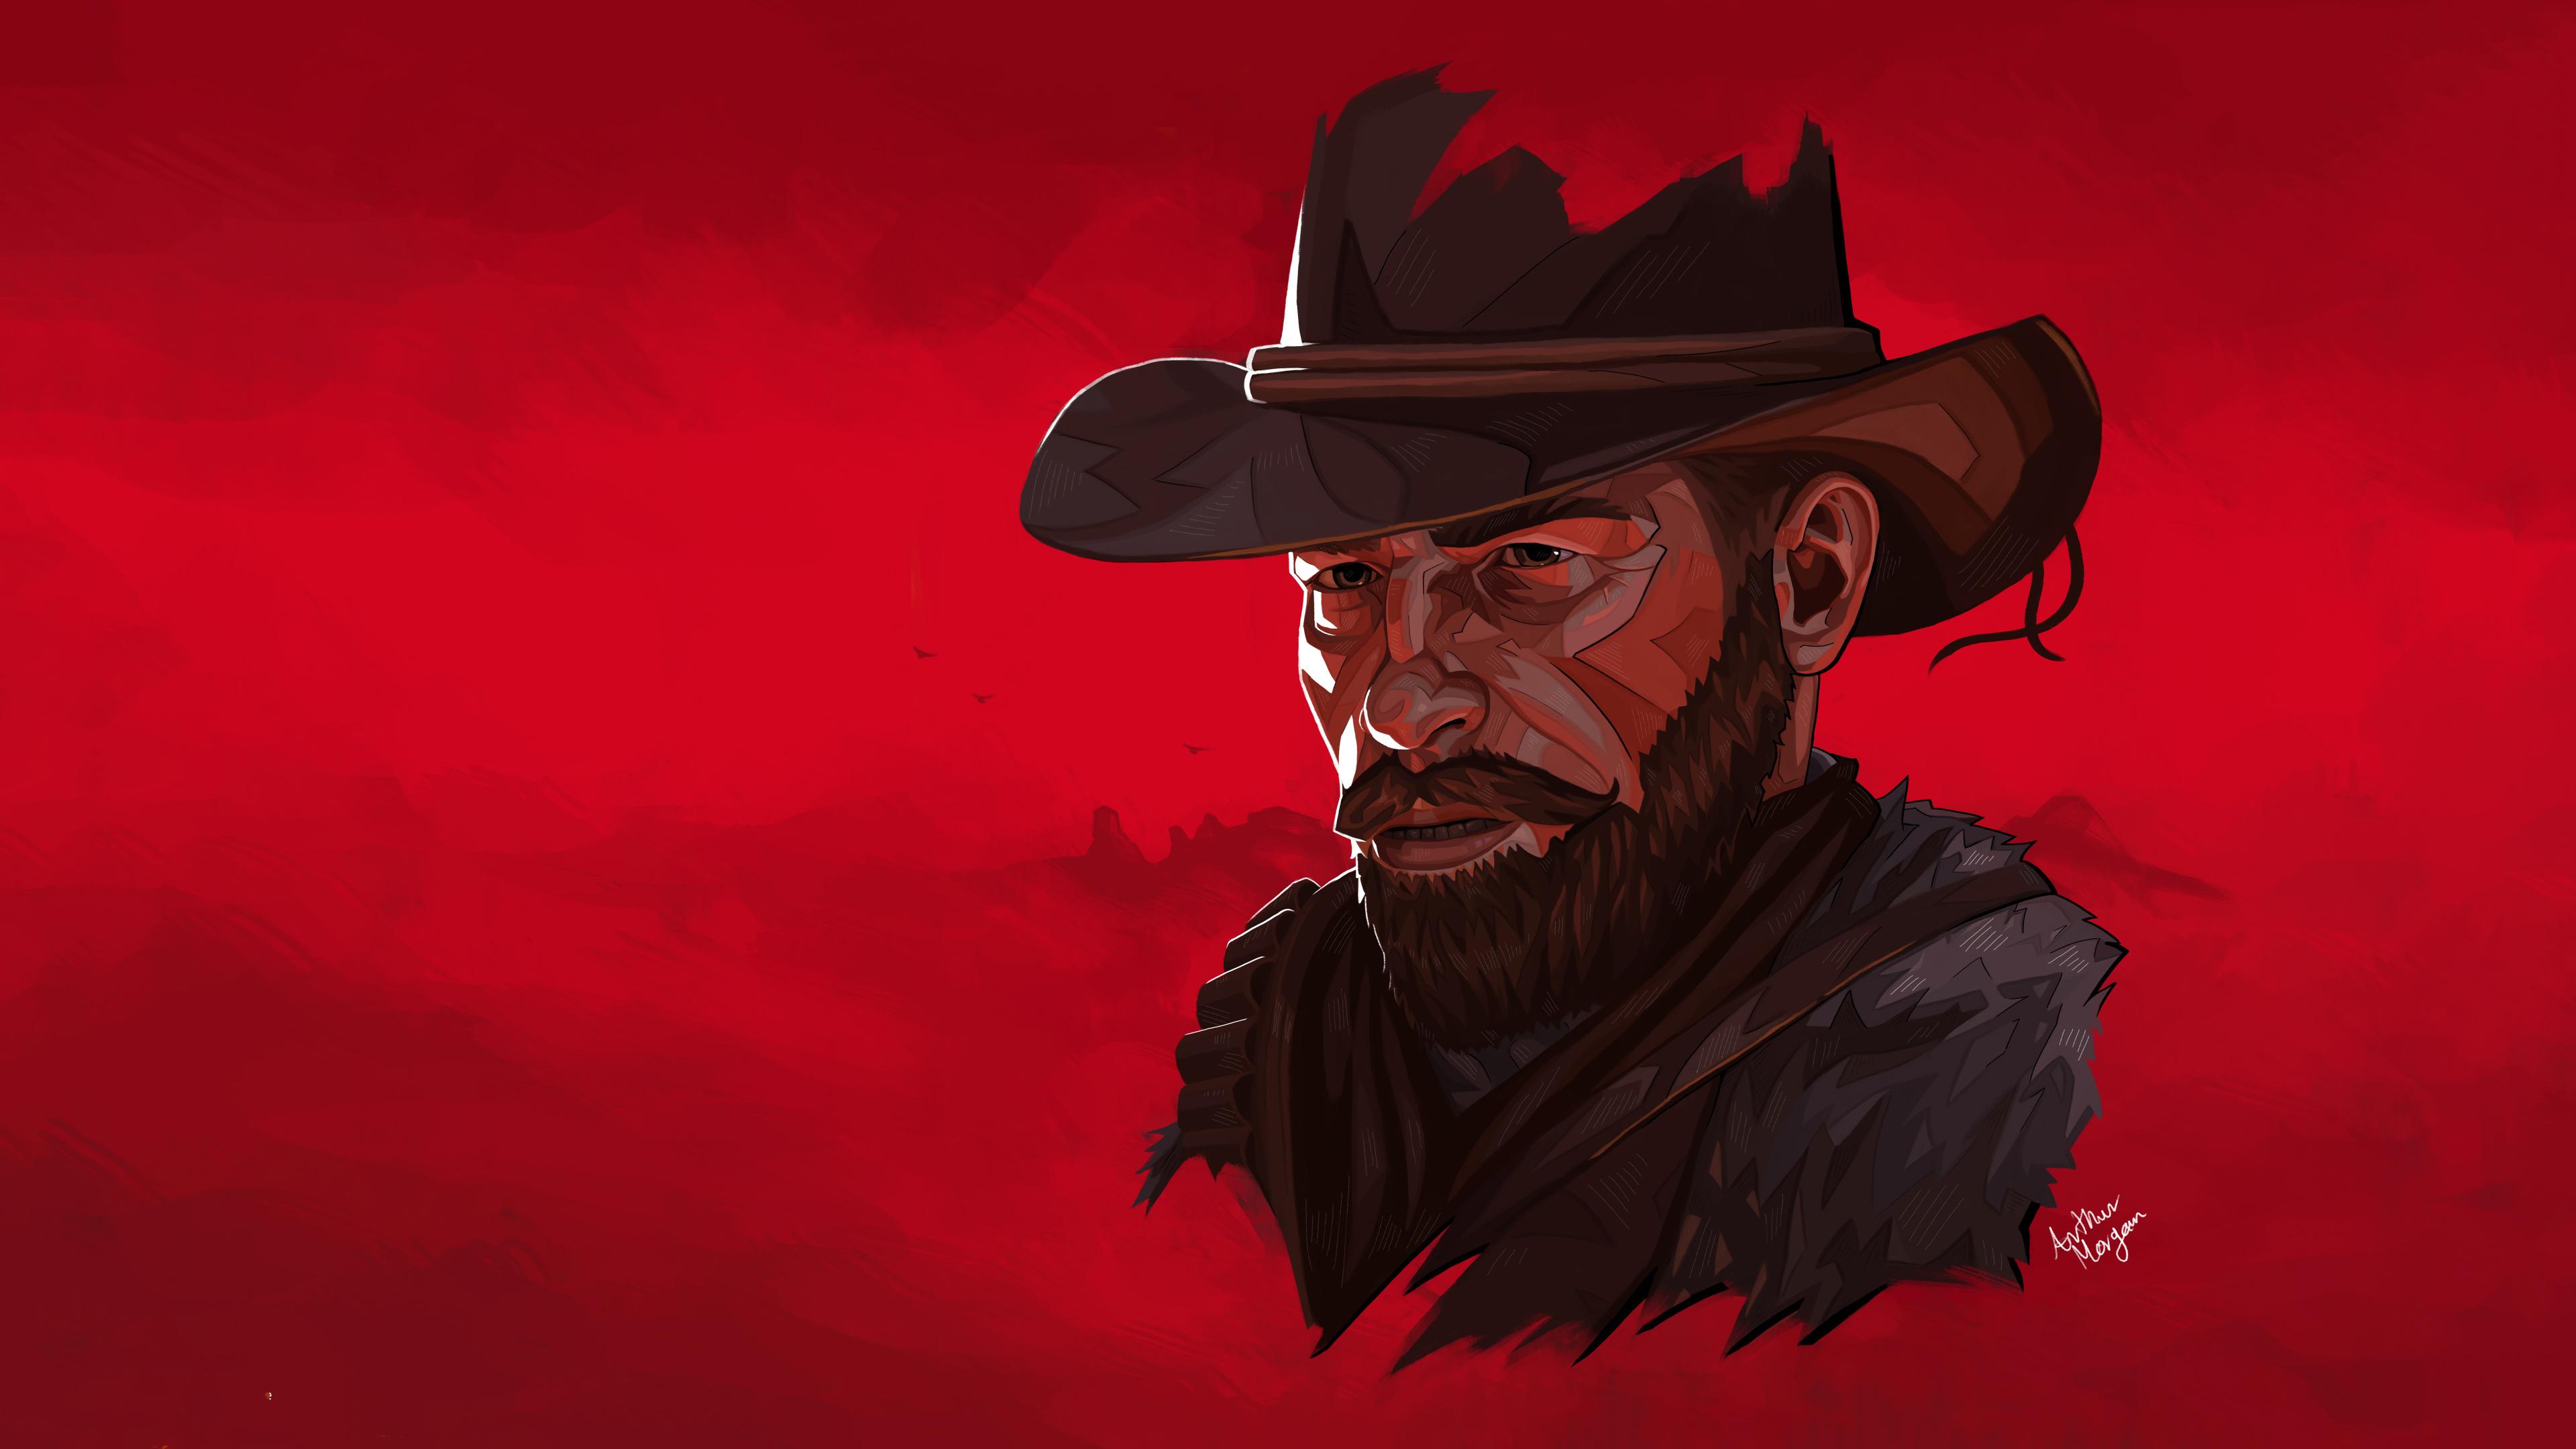 3840x2160 Arthur Morgan Red Dead Redemption 2 4k 2019 4k Hd 4k